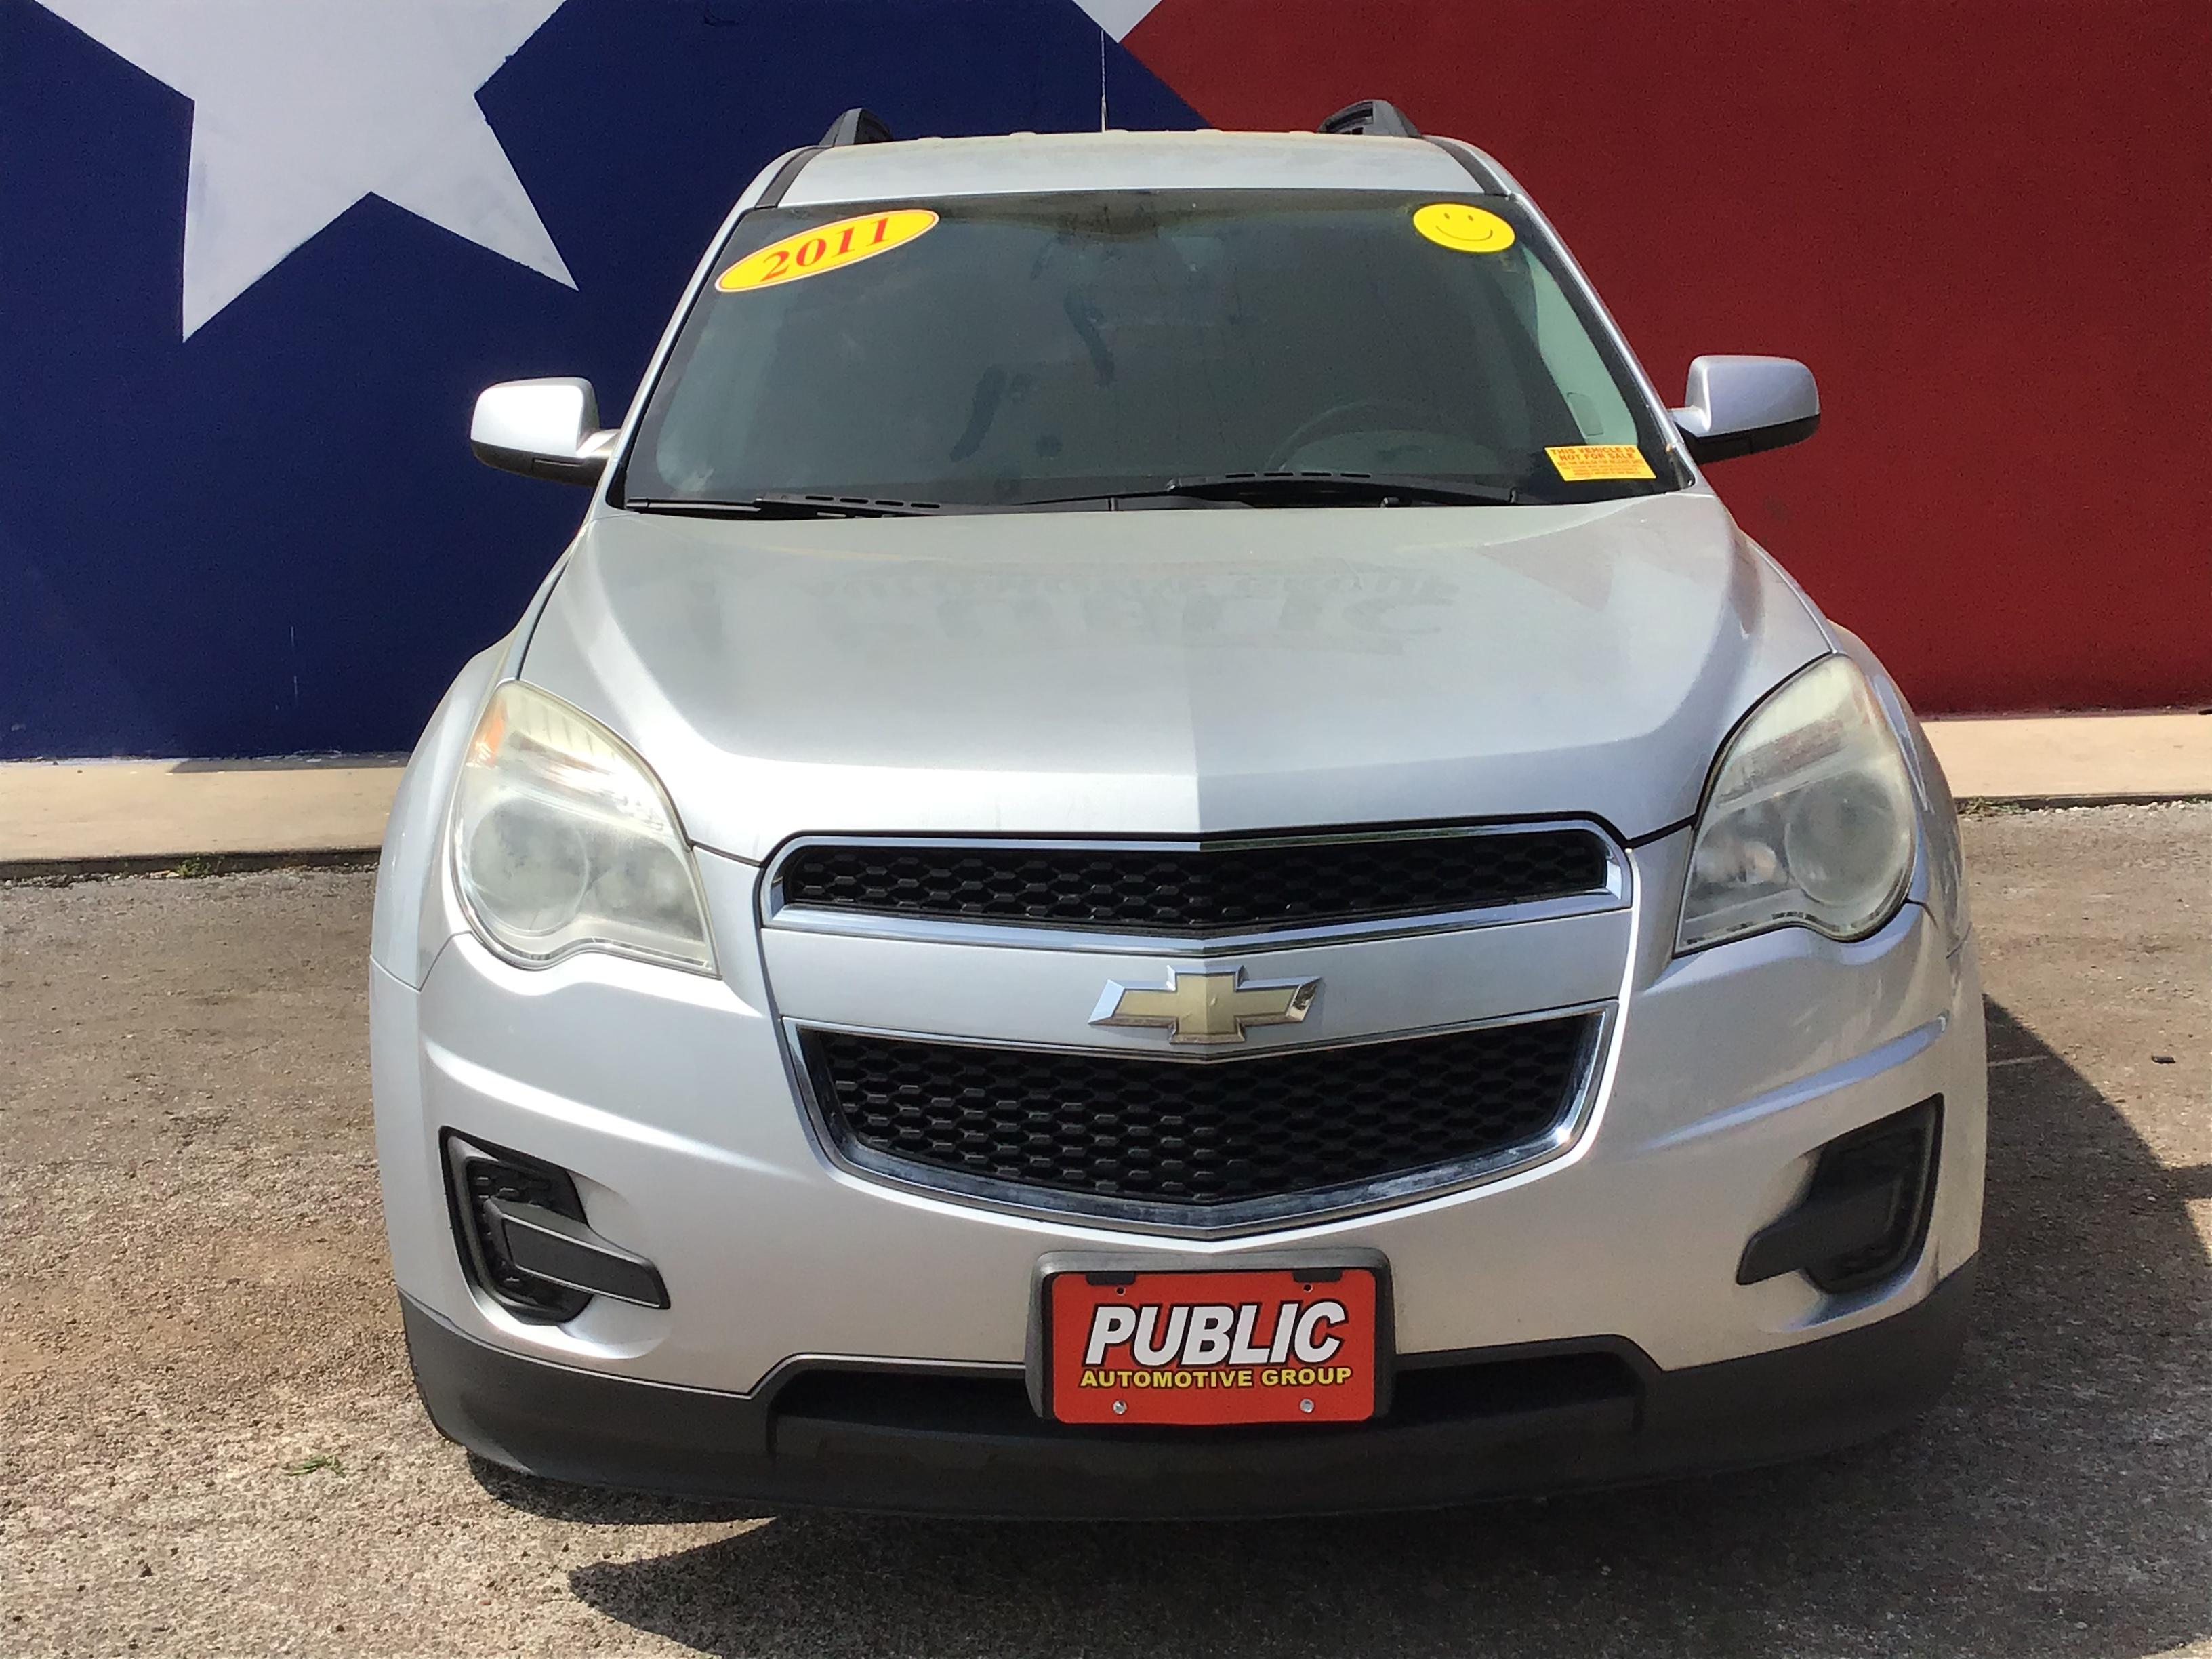 used vehicle - 2WD CHEVROLET EQUINOX 2011